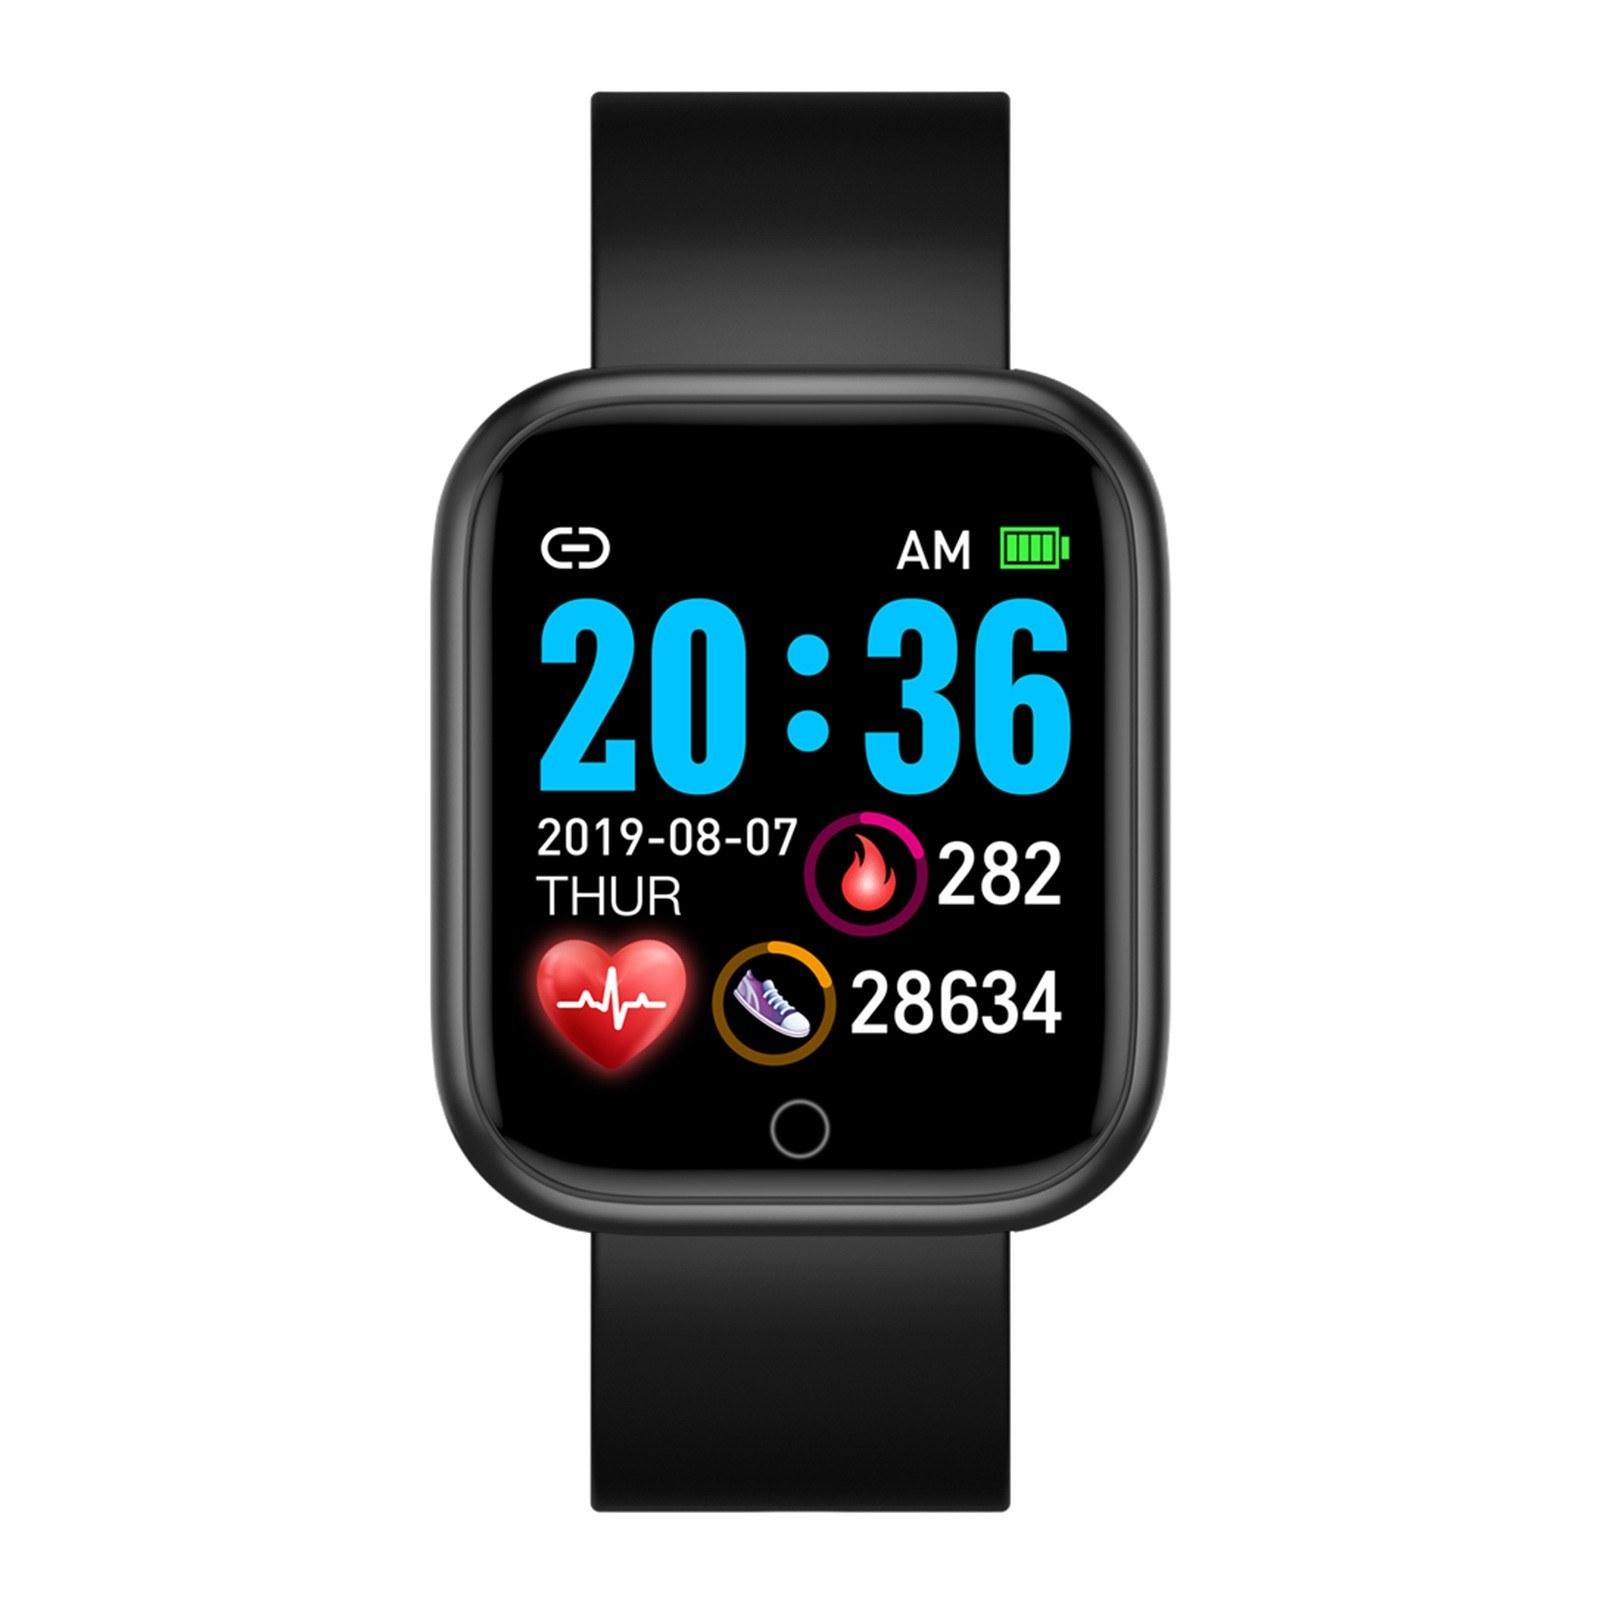 tomtop.com - 56% OFF i5PRO 1.3-Inch IPS Screen Smart Bracelet Sports Watch, Free Shipping $13.99